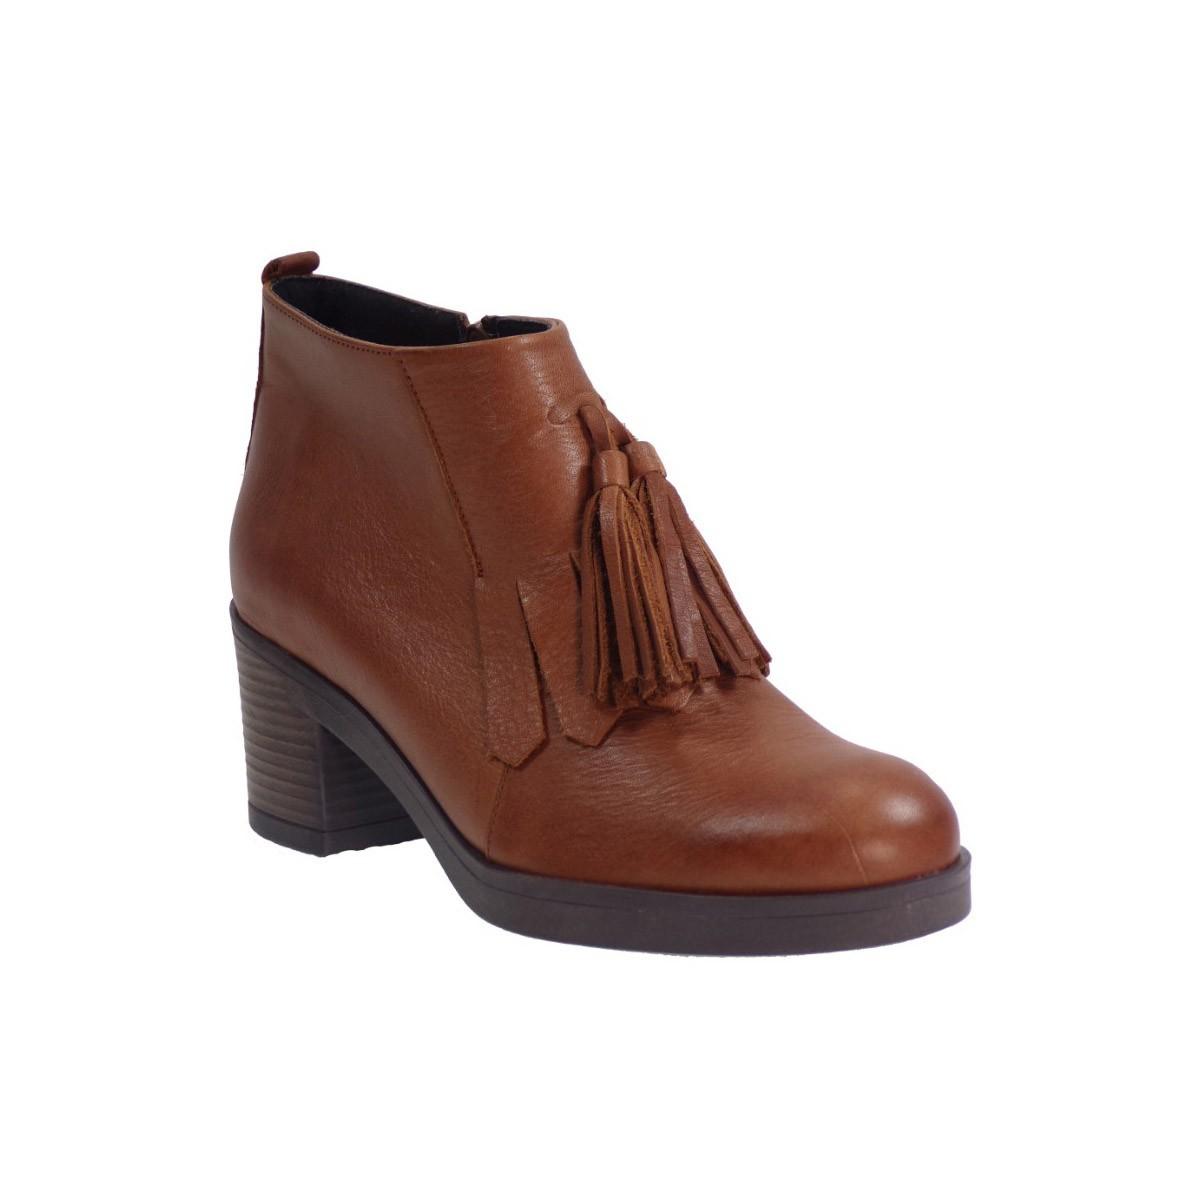 6f76c5ab2b6 Γυναικείες Μπότες & Μποτάκια (Ταξινόμηση: Φθηνότερα)   Σελίδα 238 ...